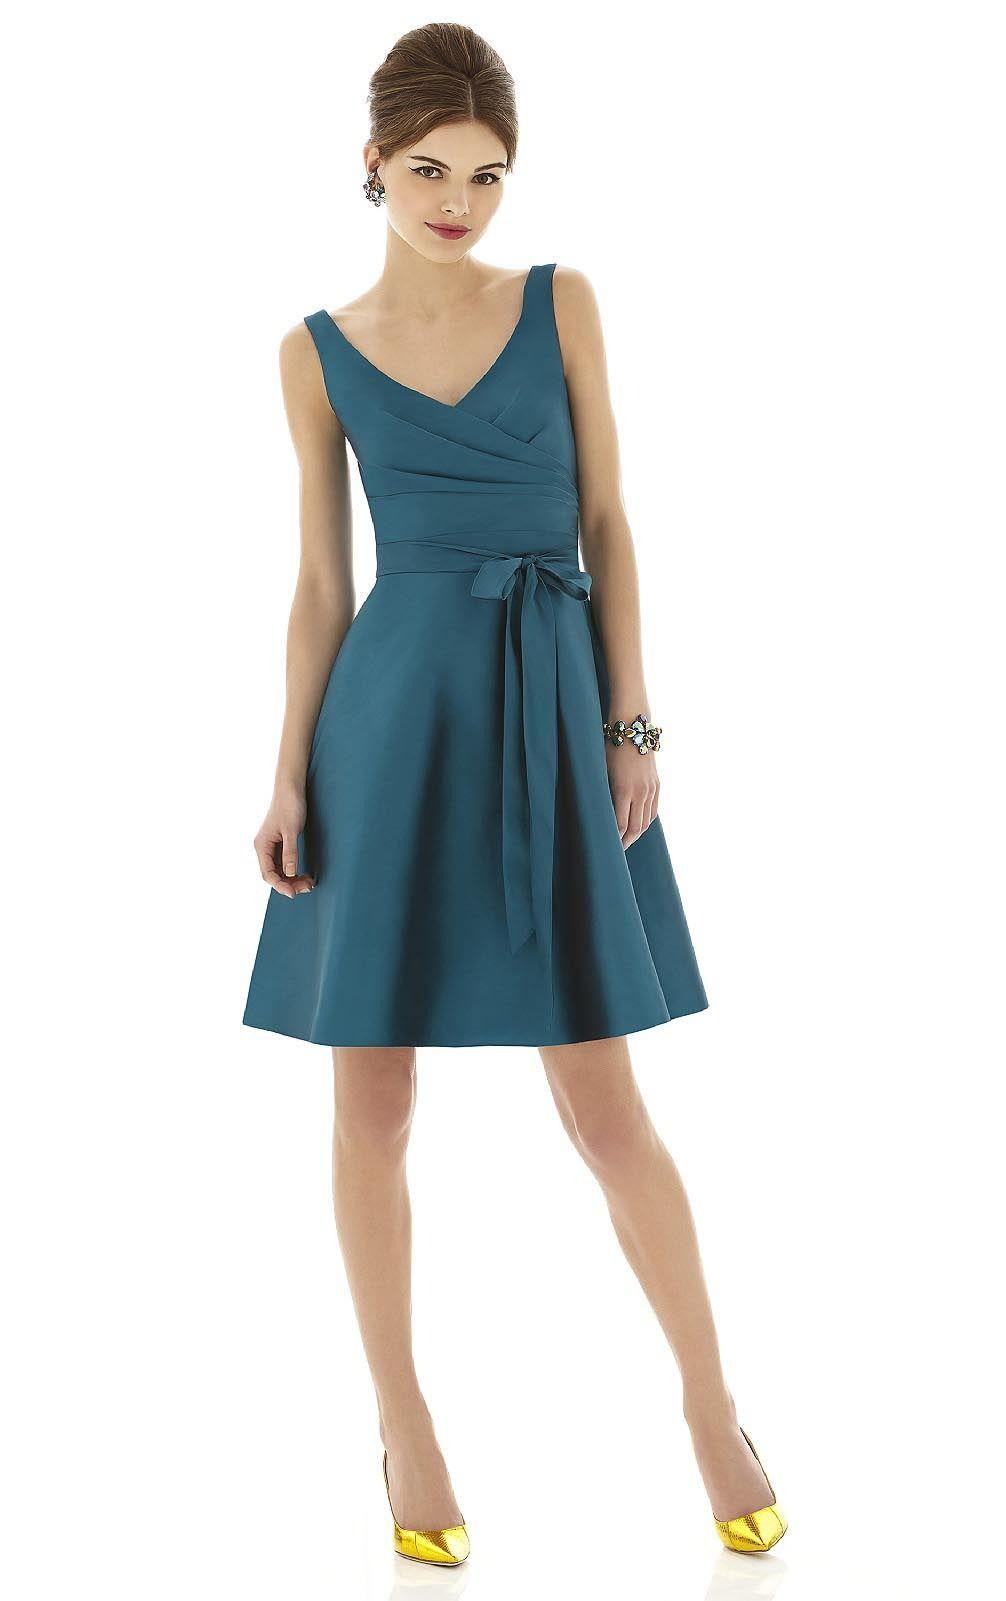 Wedding sleeveless dresses bridesmaid dressesblue sash shoulder